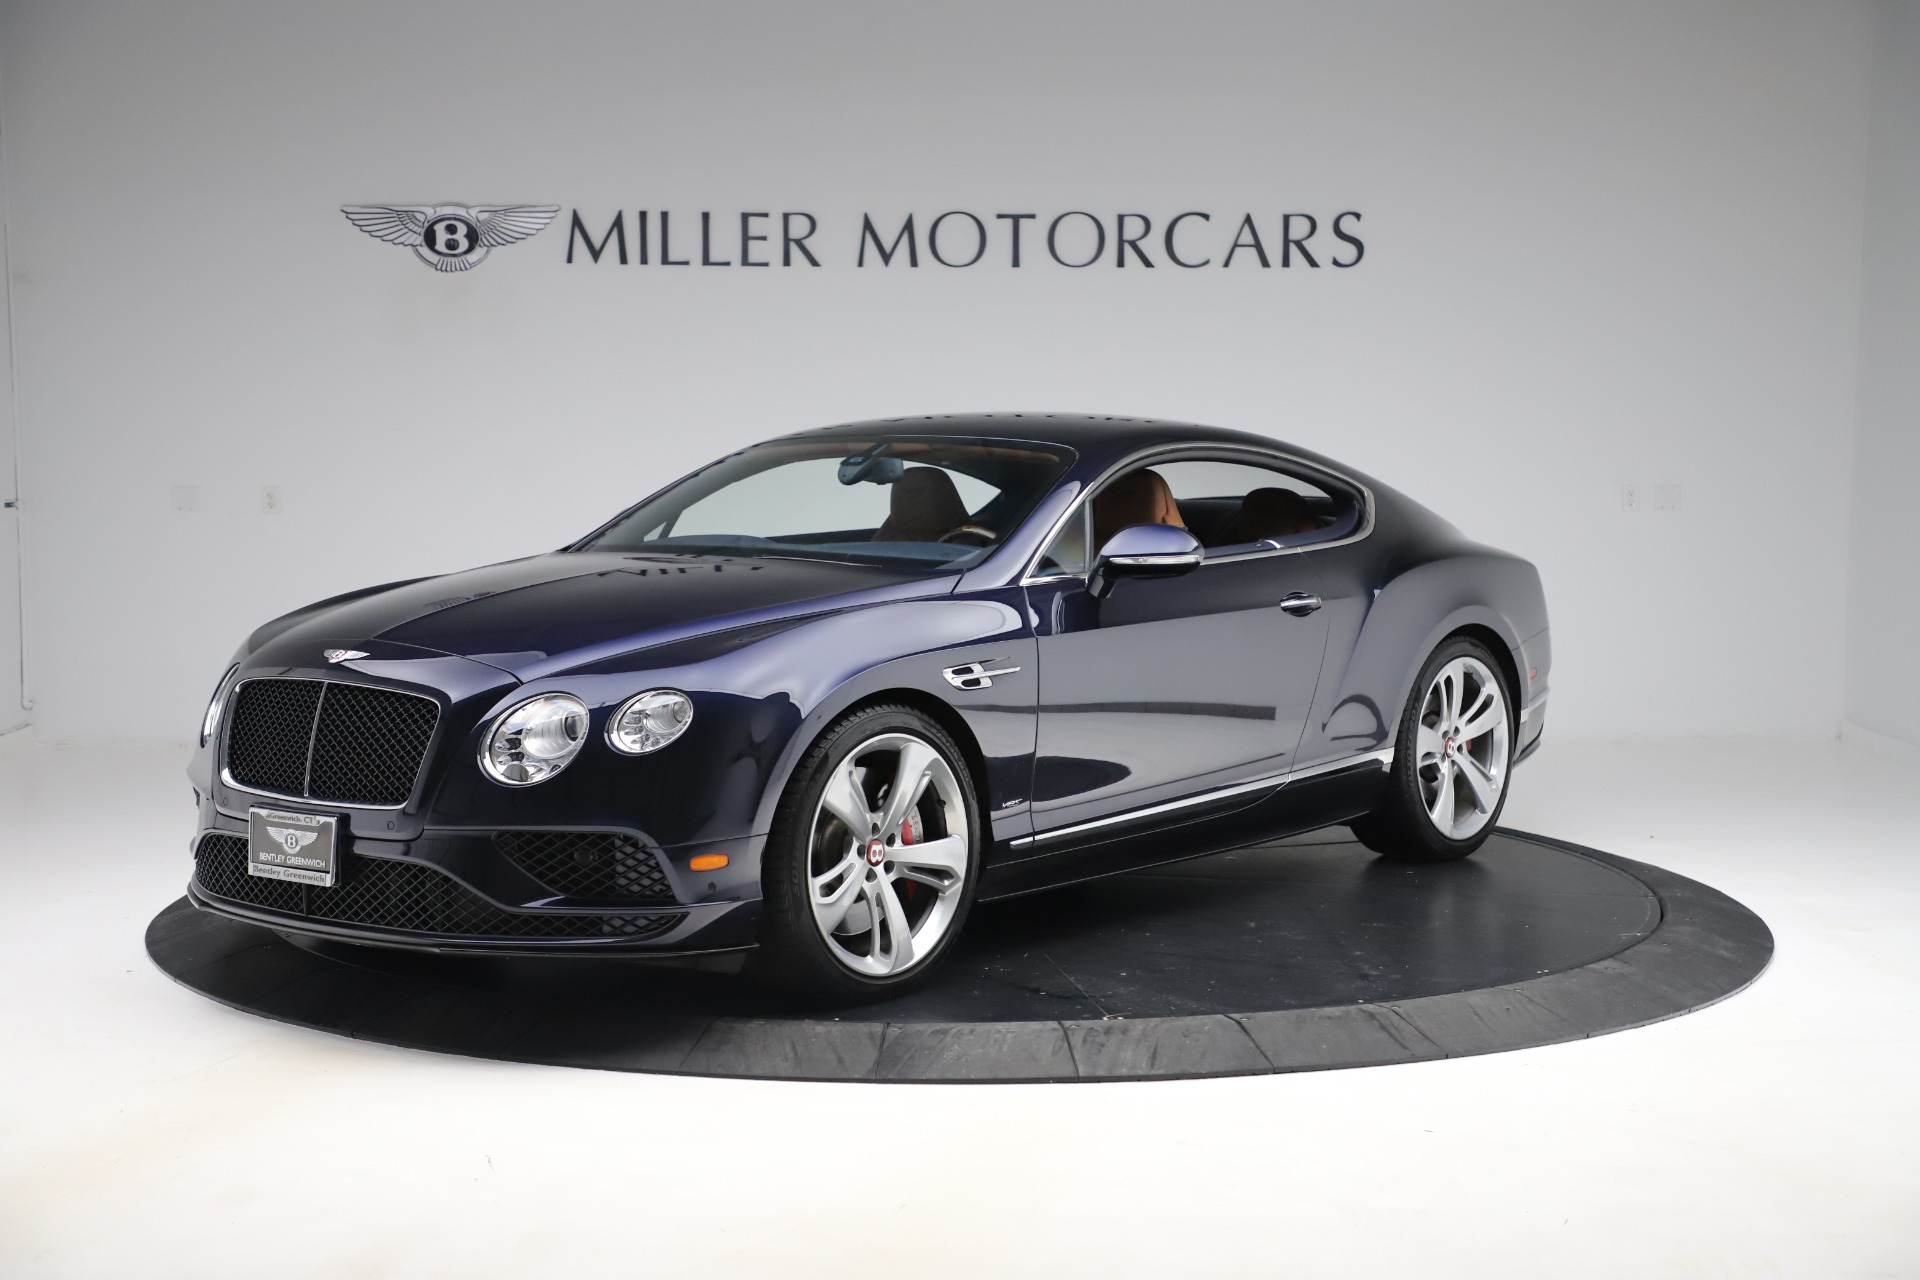 Used 2017 Bentley Continental GT V8 S for sale Sold at Alfa Romeo of Westport in Westport CT 06880 1